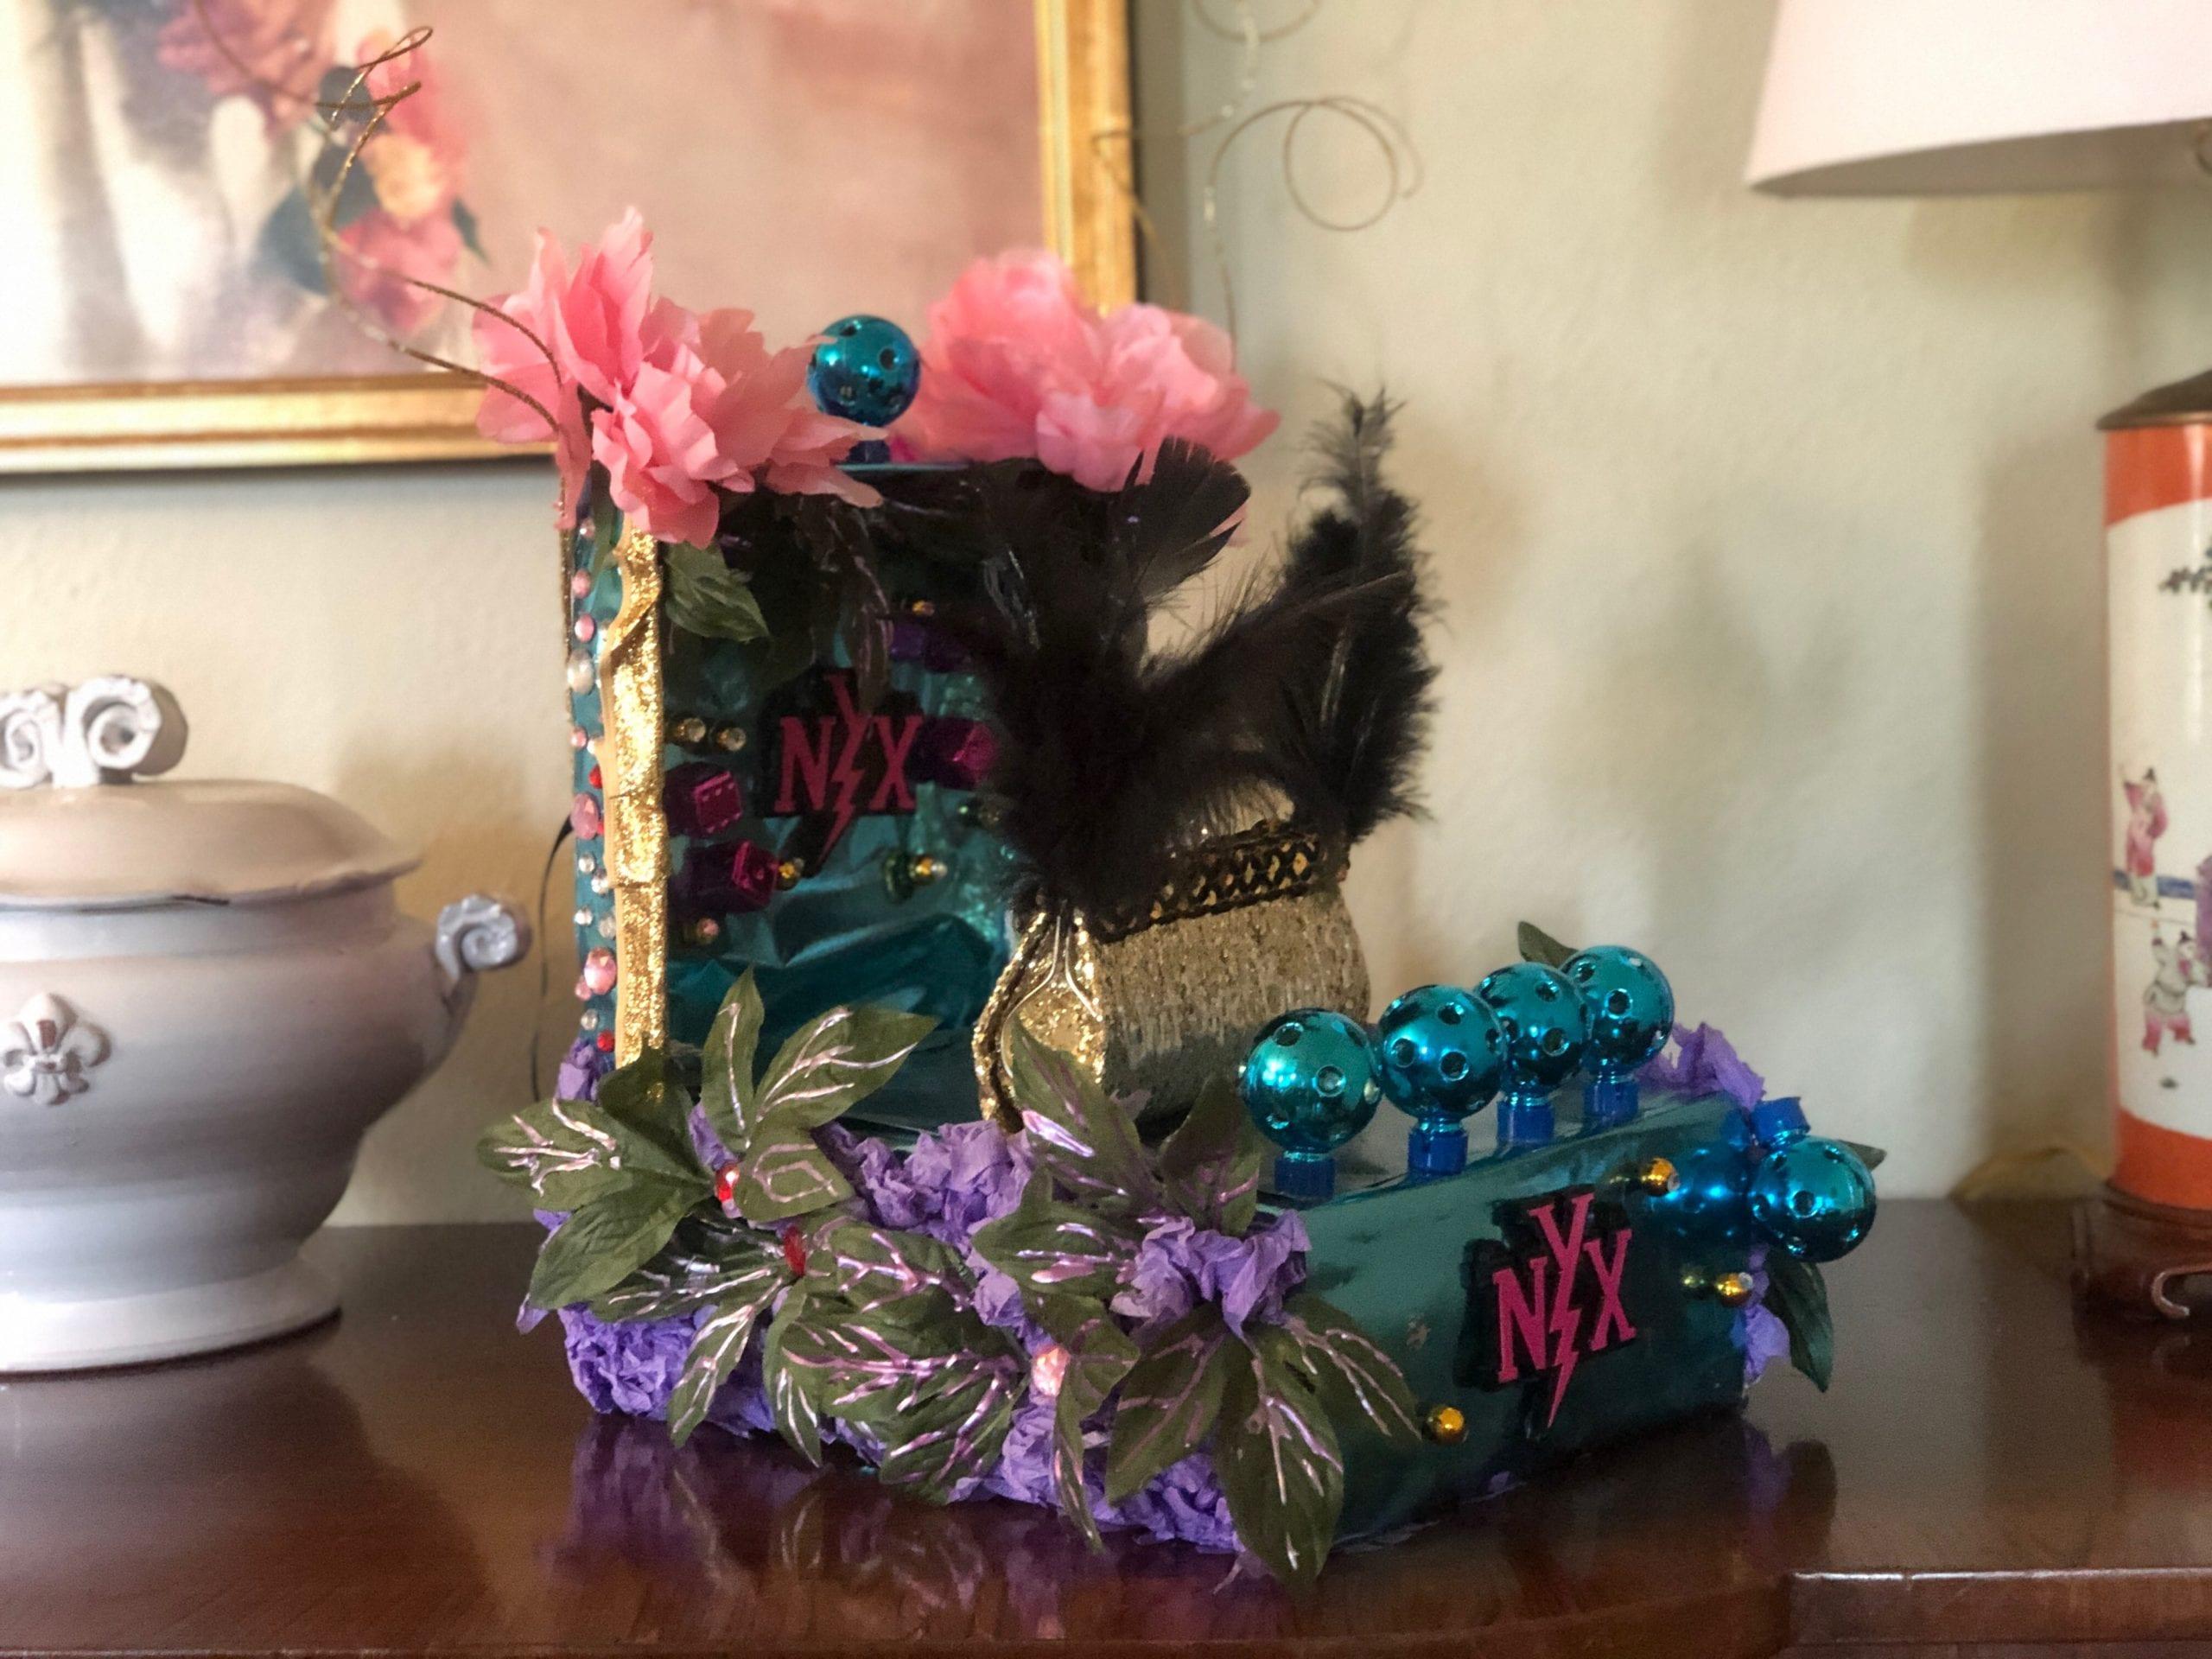 How To Make Shoe Box Floats A Mardi Gras Tradition For Nola Kids